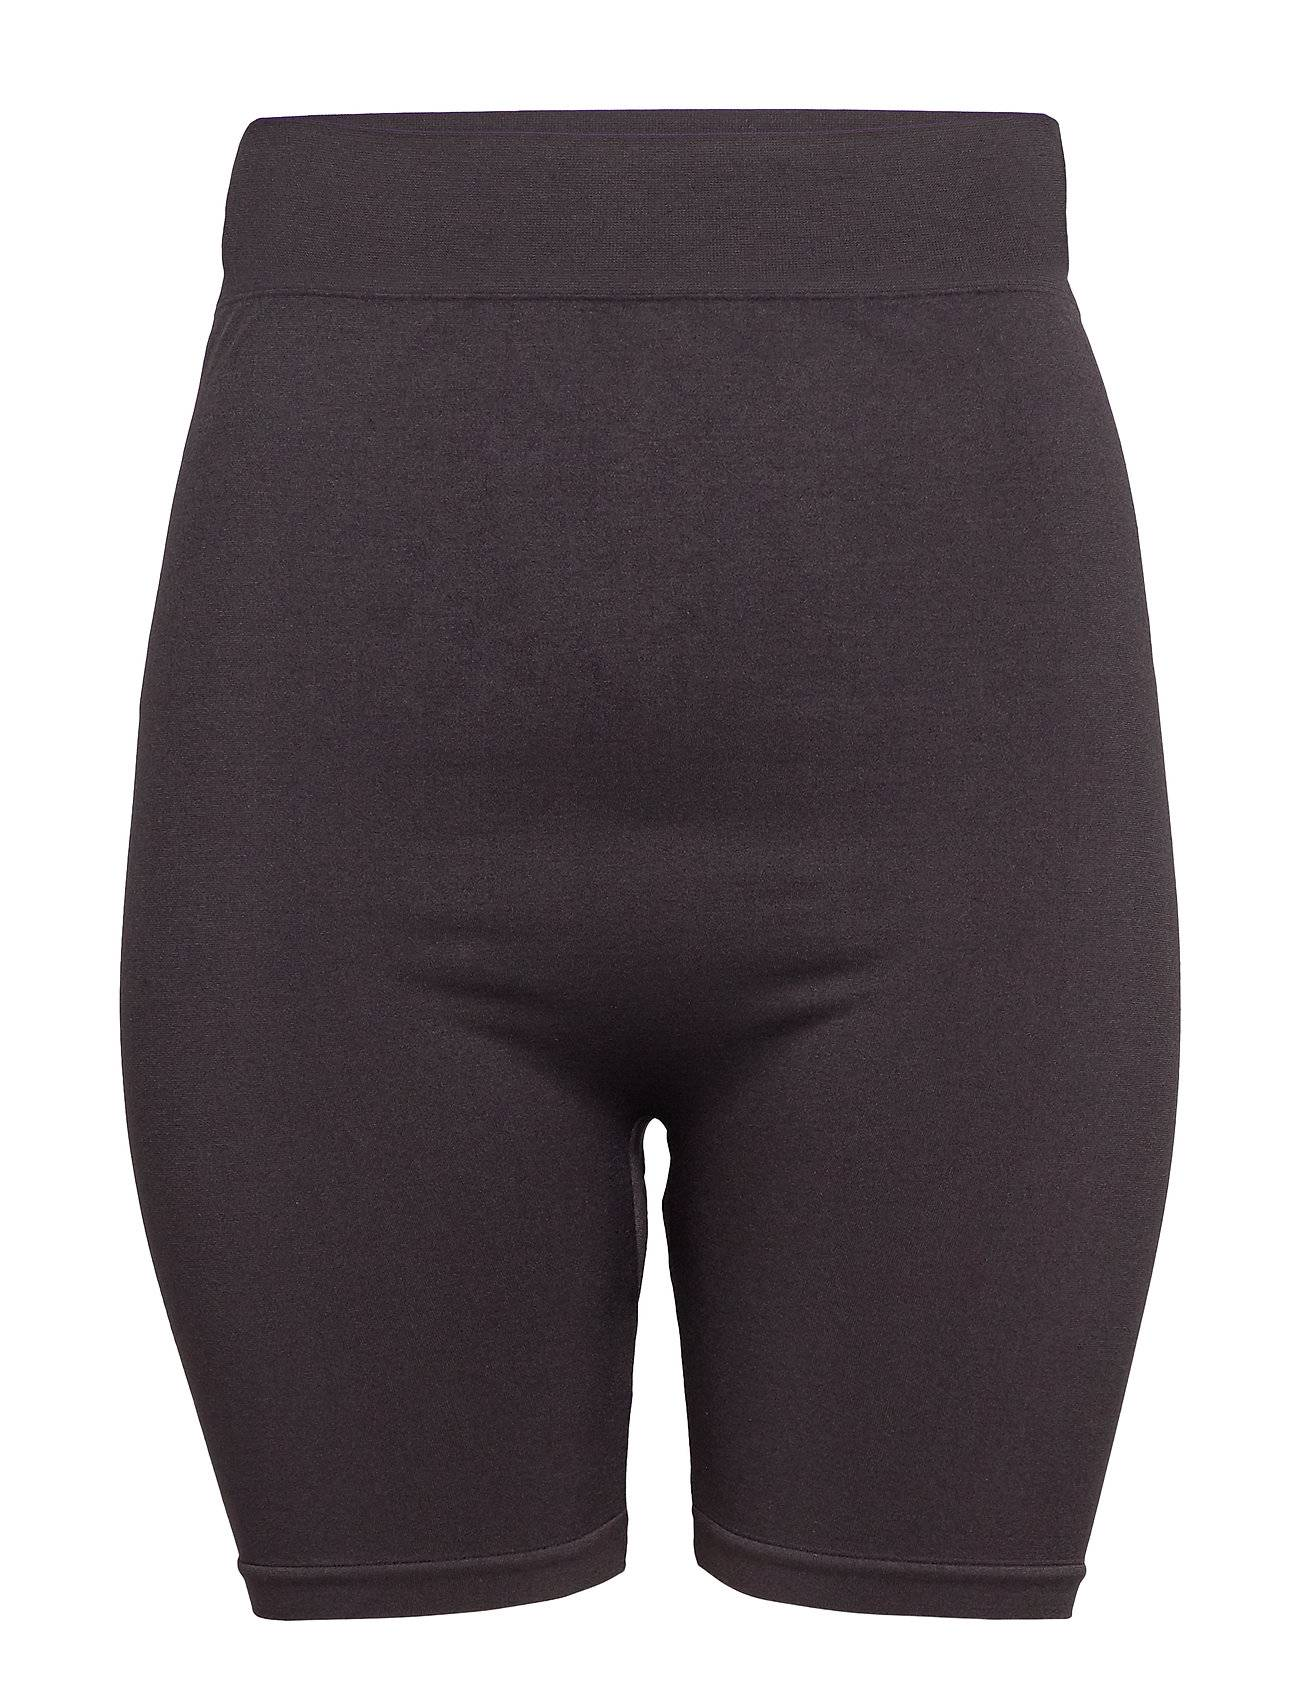 Image of ONLY Carmakoma Carstephanie Seamless Hw Shorts Lingerie Shapewear Bottoms Musta ONLY Carmakoma